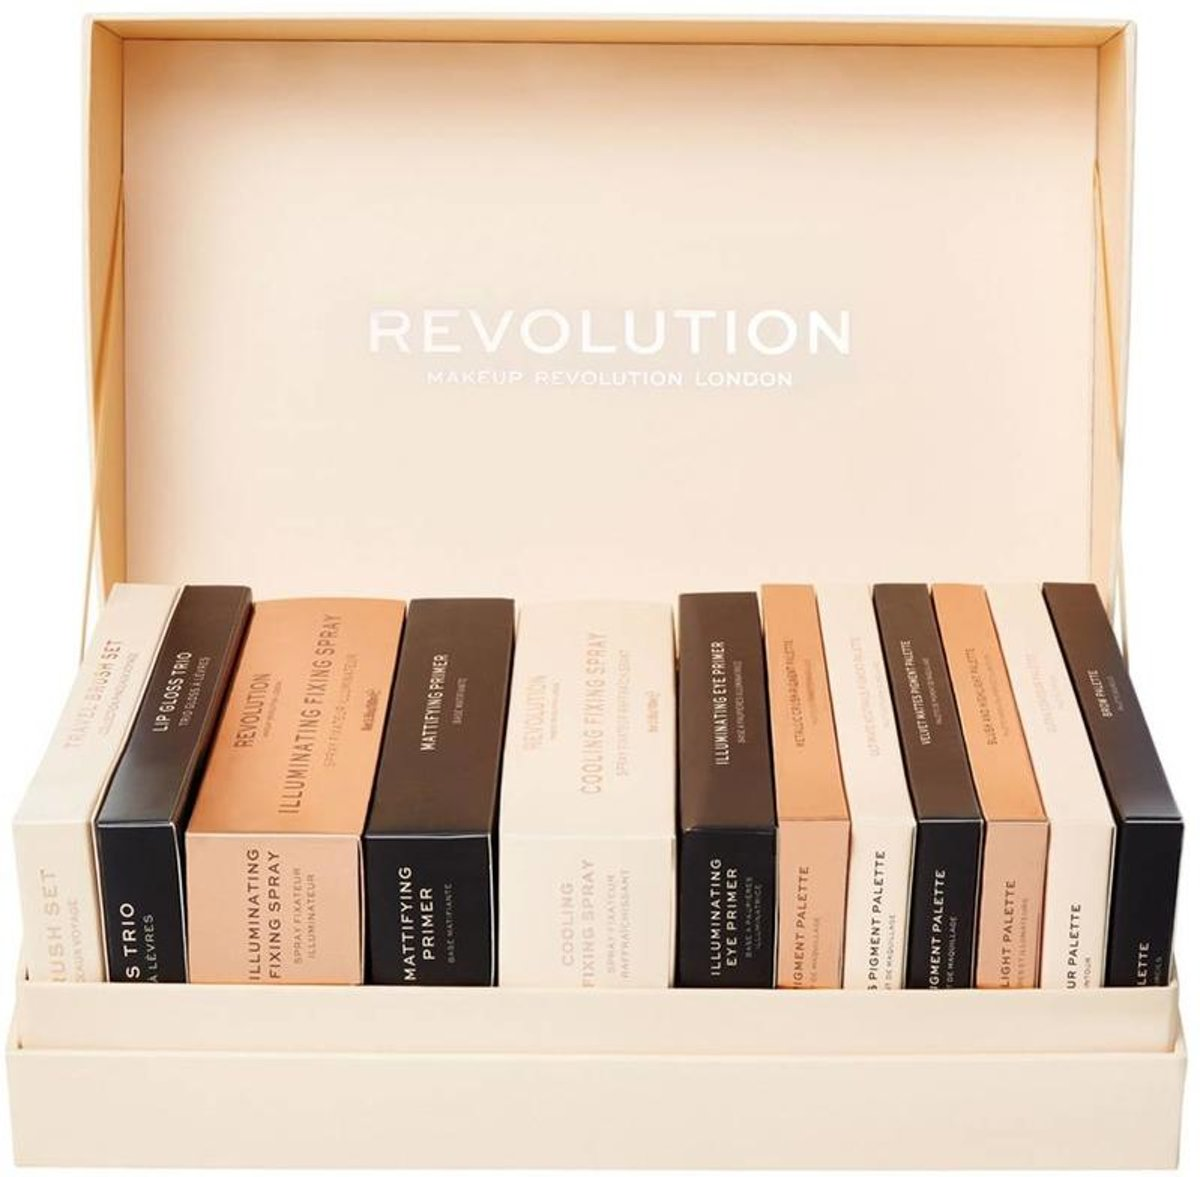 Makeup Revolution 12 Days of Christmas 2018 Beauty Advent Make Up Gift Set